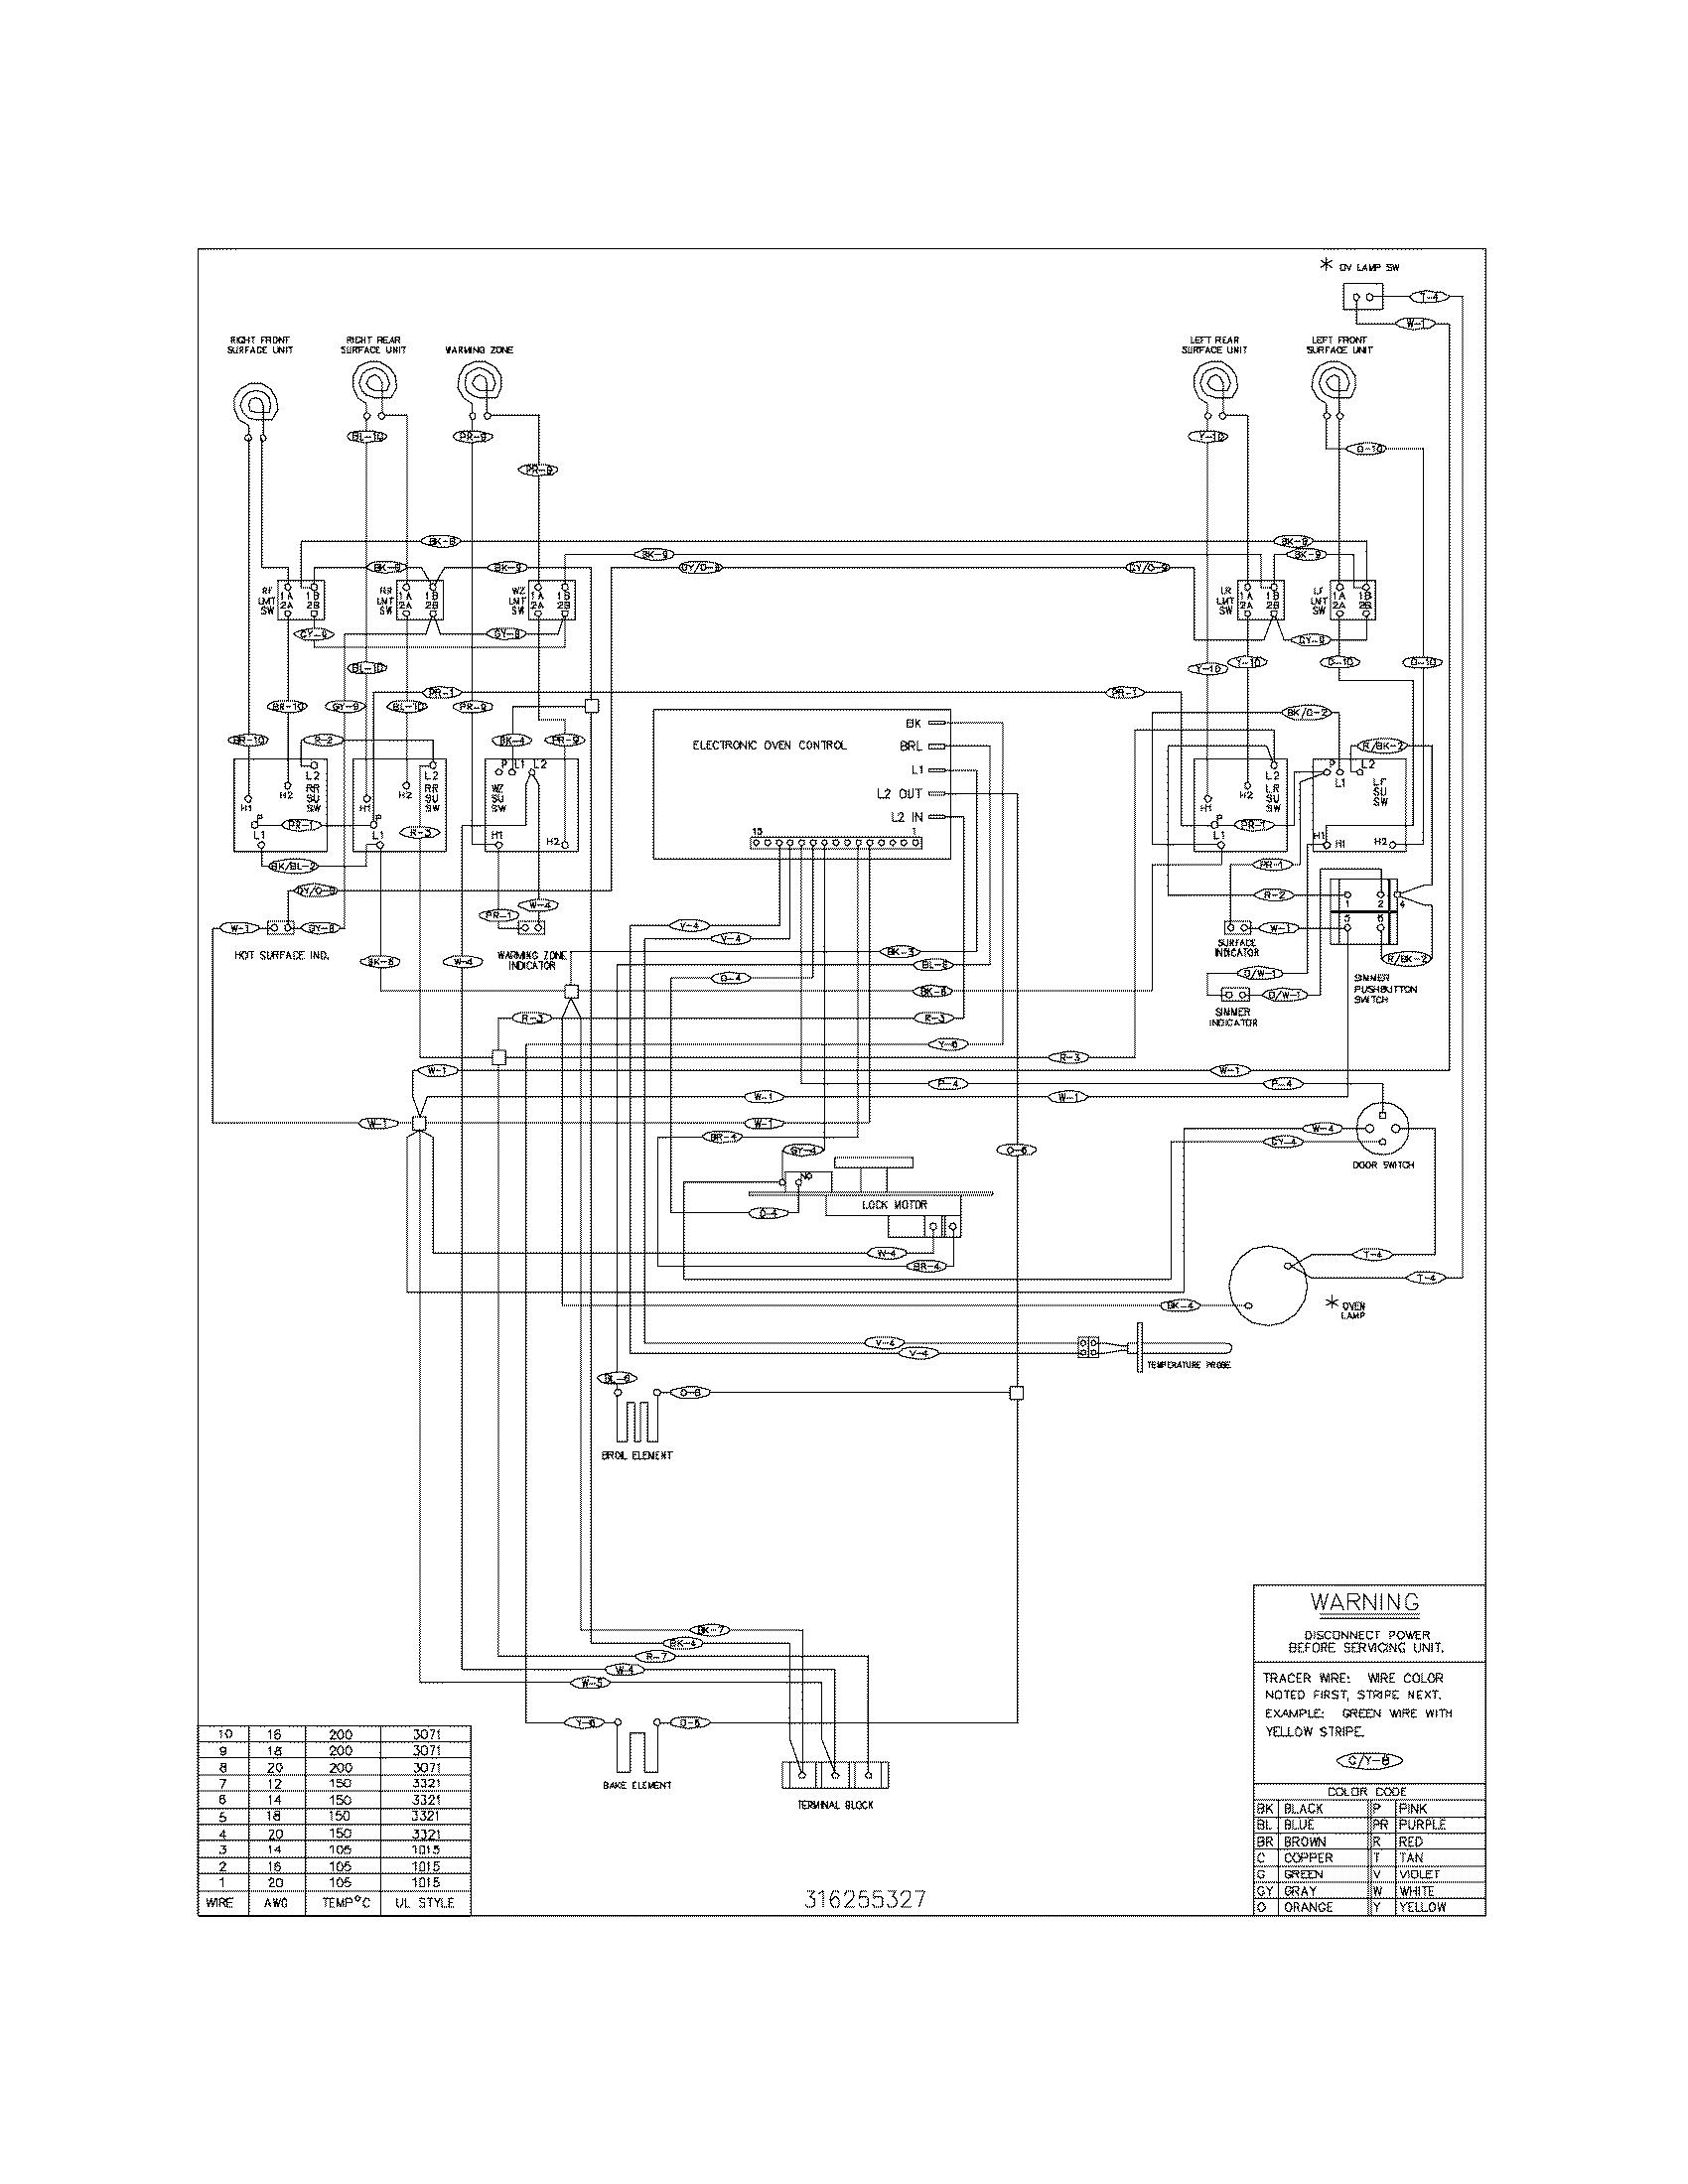 lighter usb adapter wiring schematic